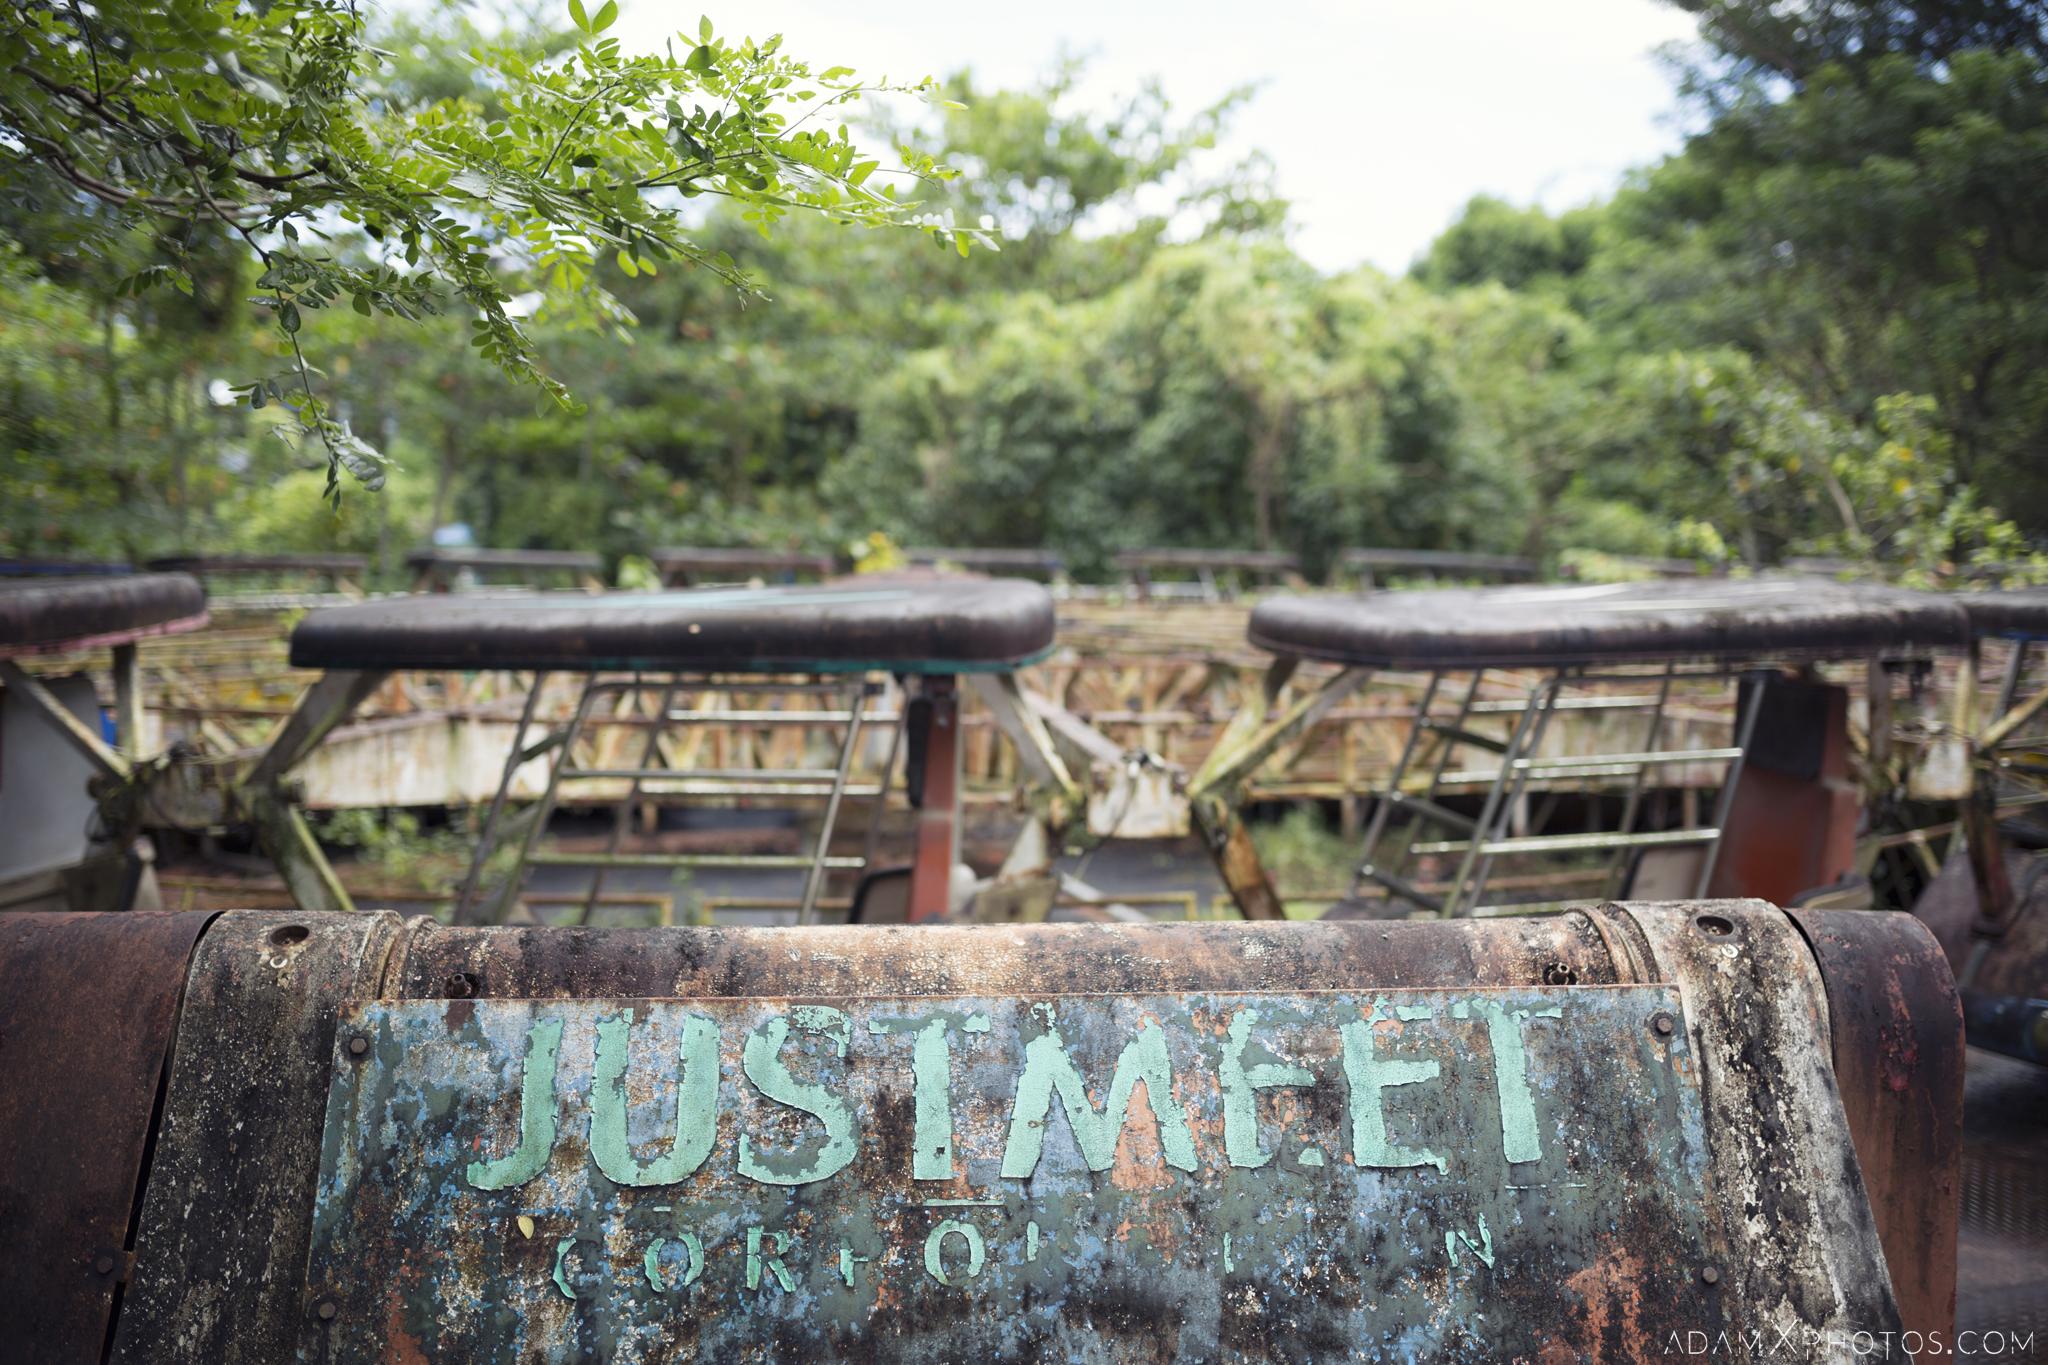 Justmeet Corporation Happy World Theme Park Amusement Park Fairground Myanmar Burma Yangon Rangoon Urbex Adam X Urban Exploration Access 2016 Abandoned decay lost forgotten derelict location creepy haunting eerie